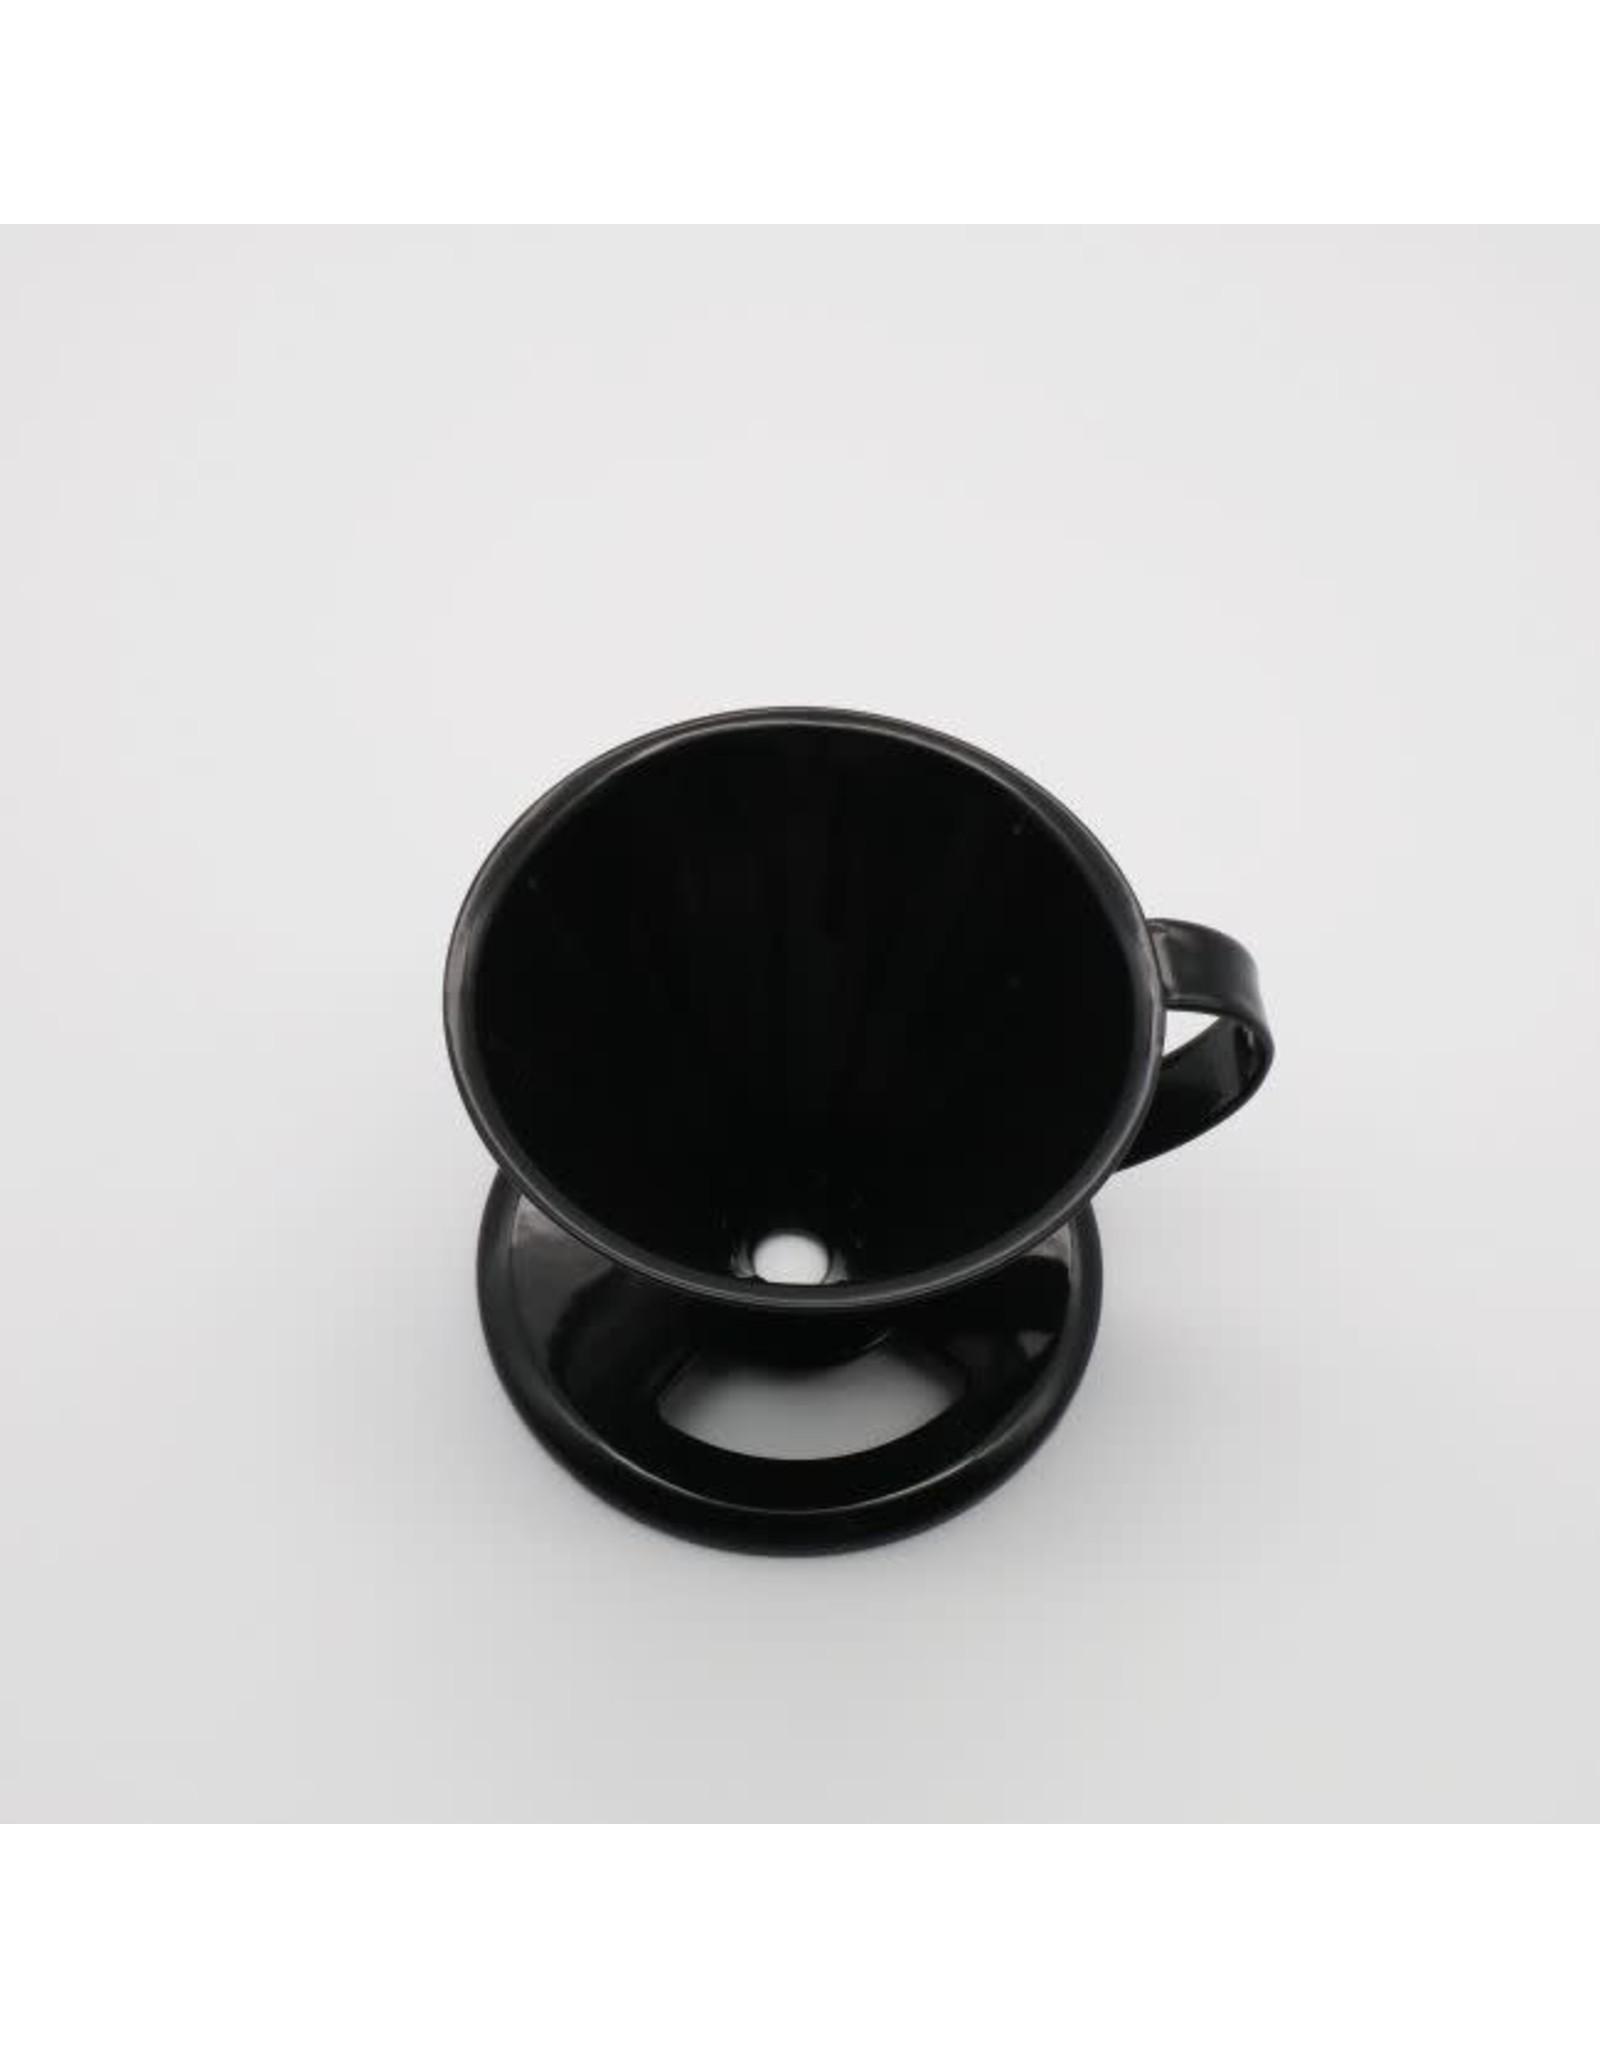 GSP GSP TSUBAME COFFEE DRIPPER 2.0 BLACK